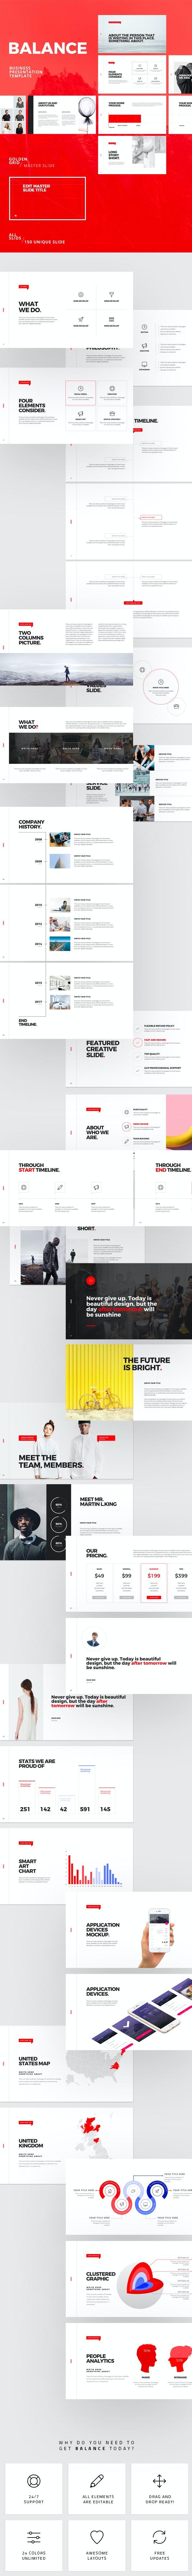 Balance Powerpoint Template - Business PowerPoint Templates